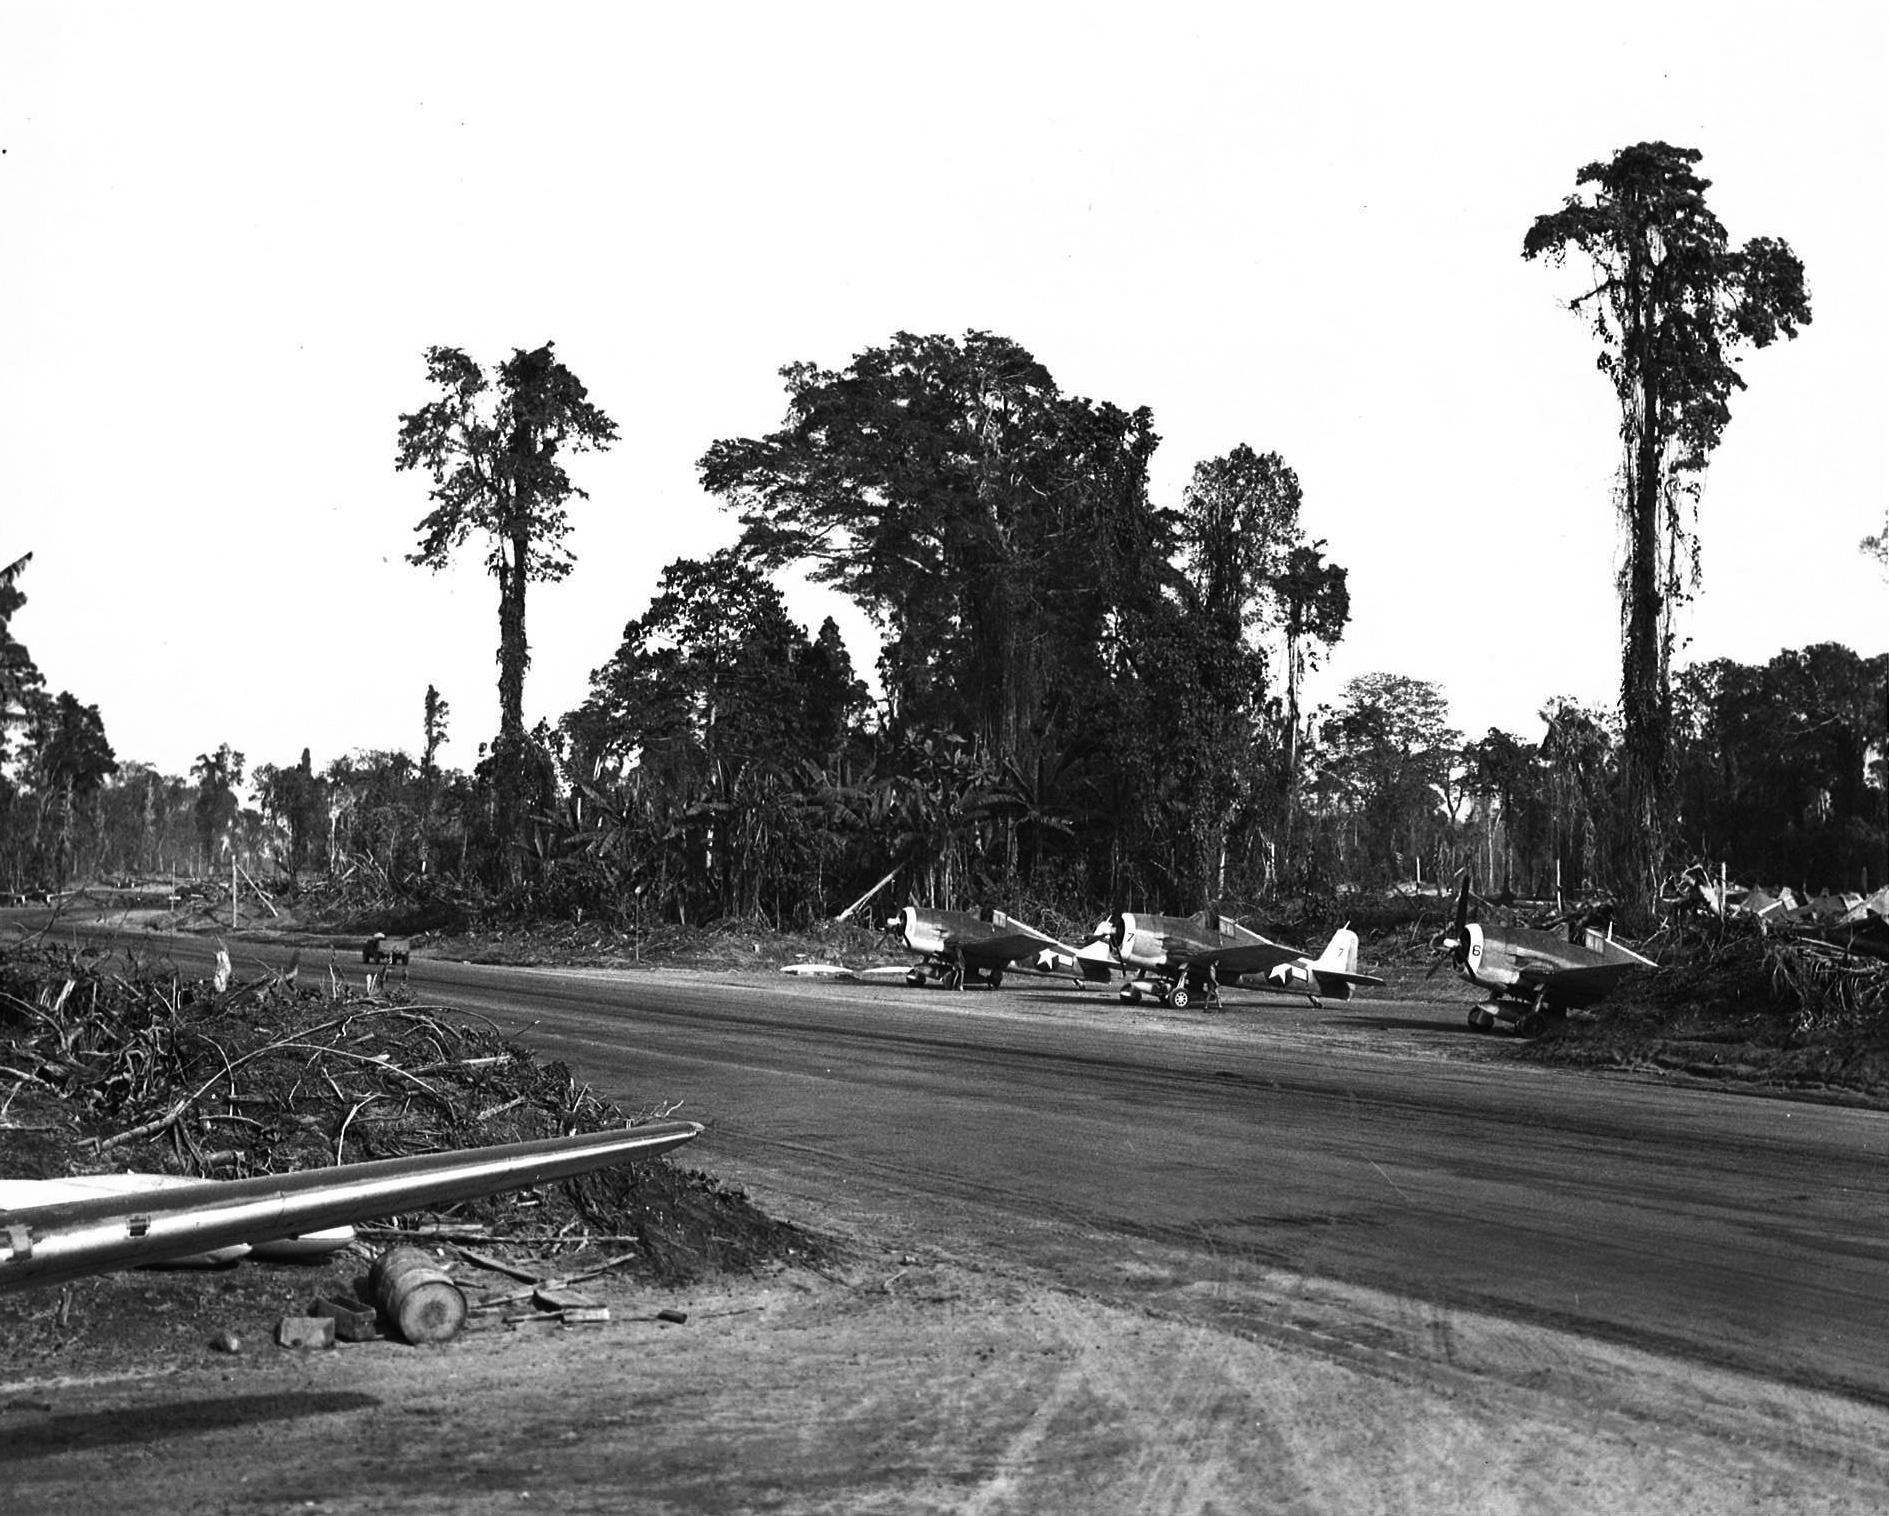 Grumman F6F 3 Hellcat VF 38 Black 1, 6 and 7 Henderson Field Guadalcanal Solomon Islands Sep 1943 01